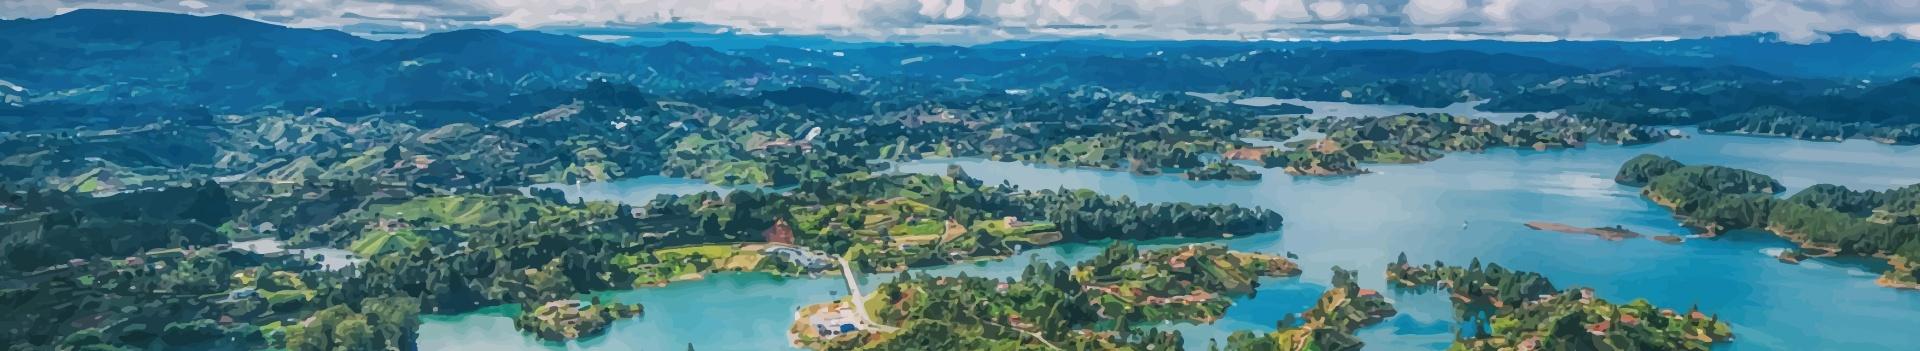 Kitesurfing in Colombia